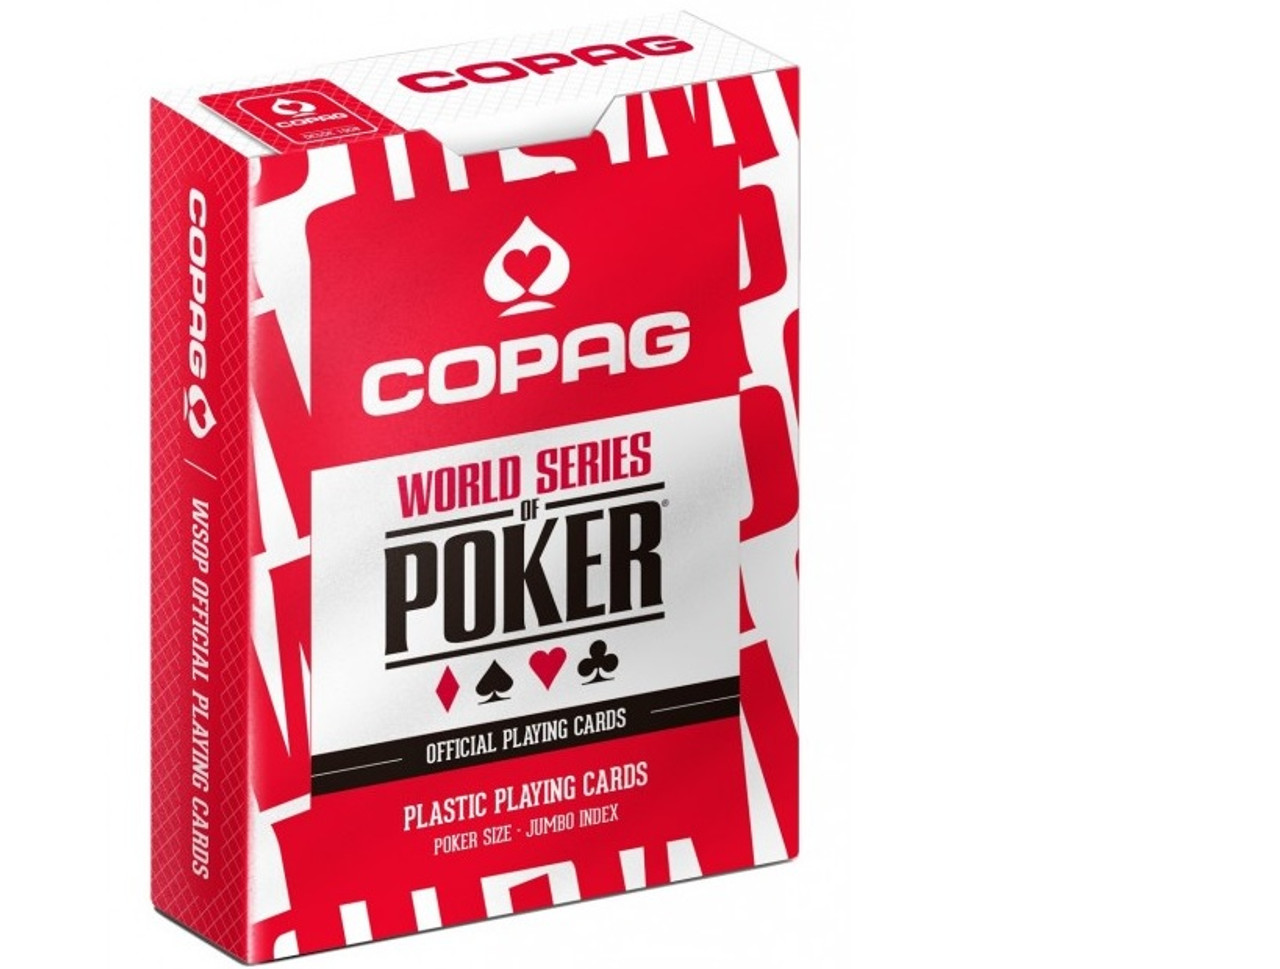 Carti profesionale WSOP 100% plastic cu JUMBO index si spate rosu